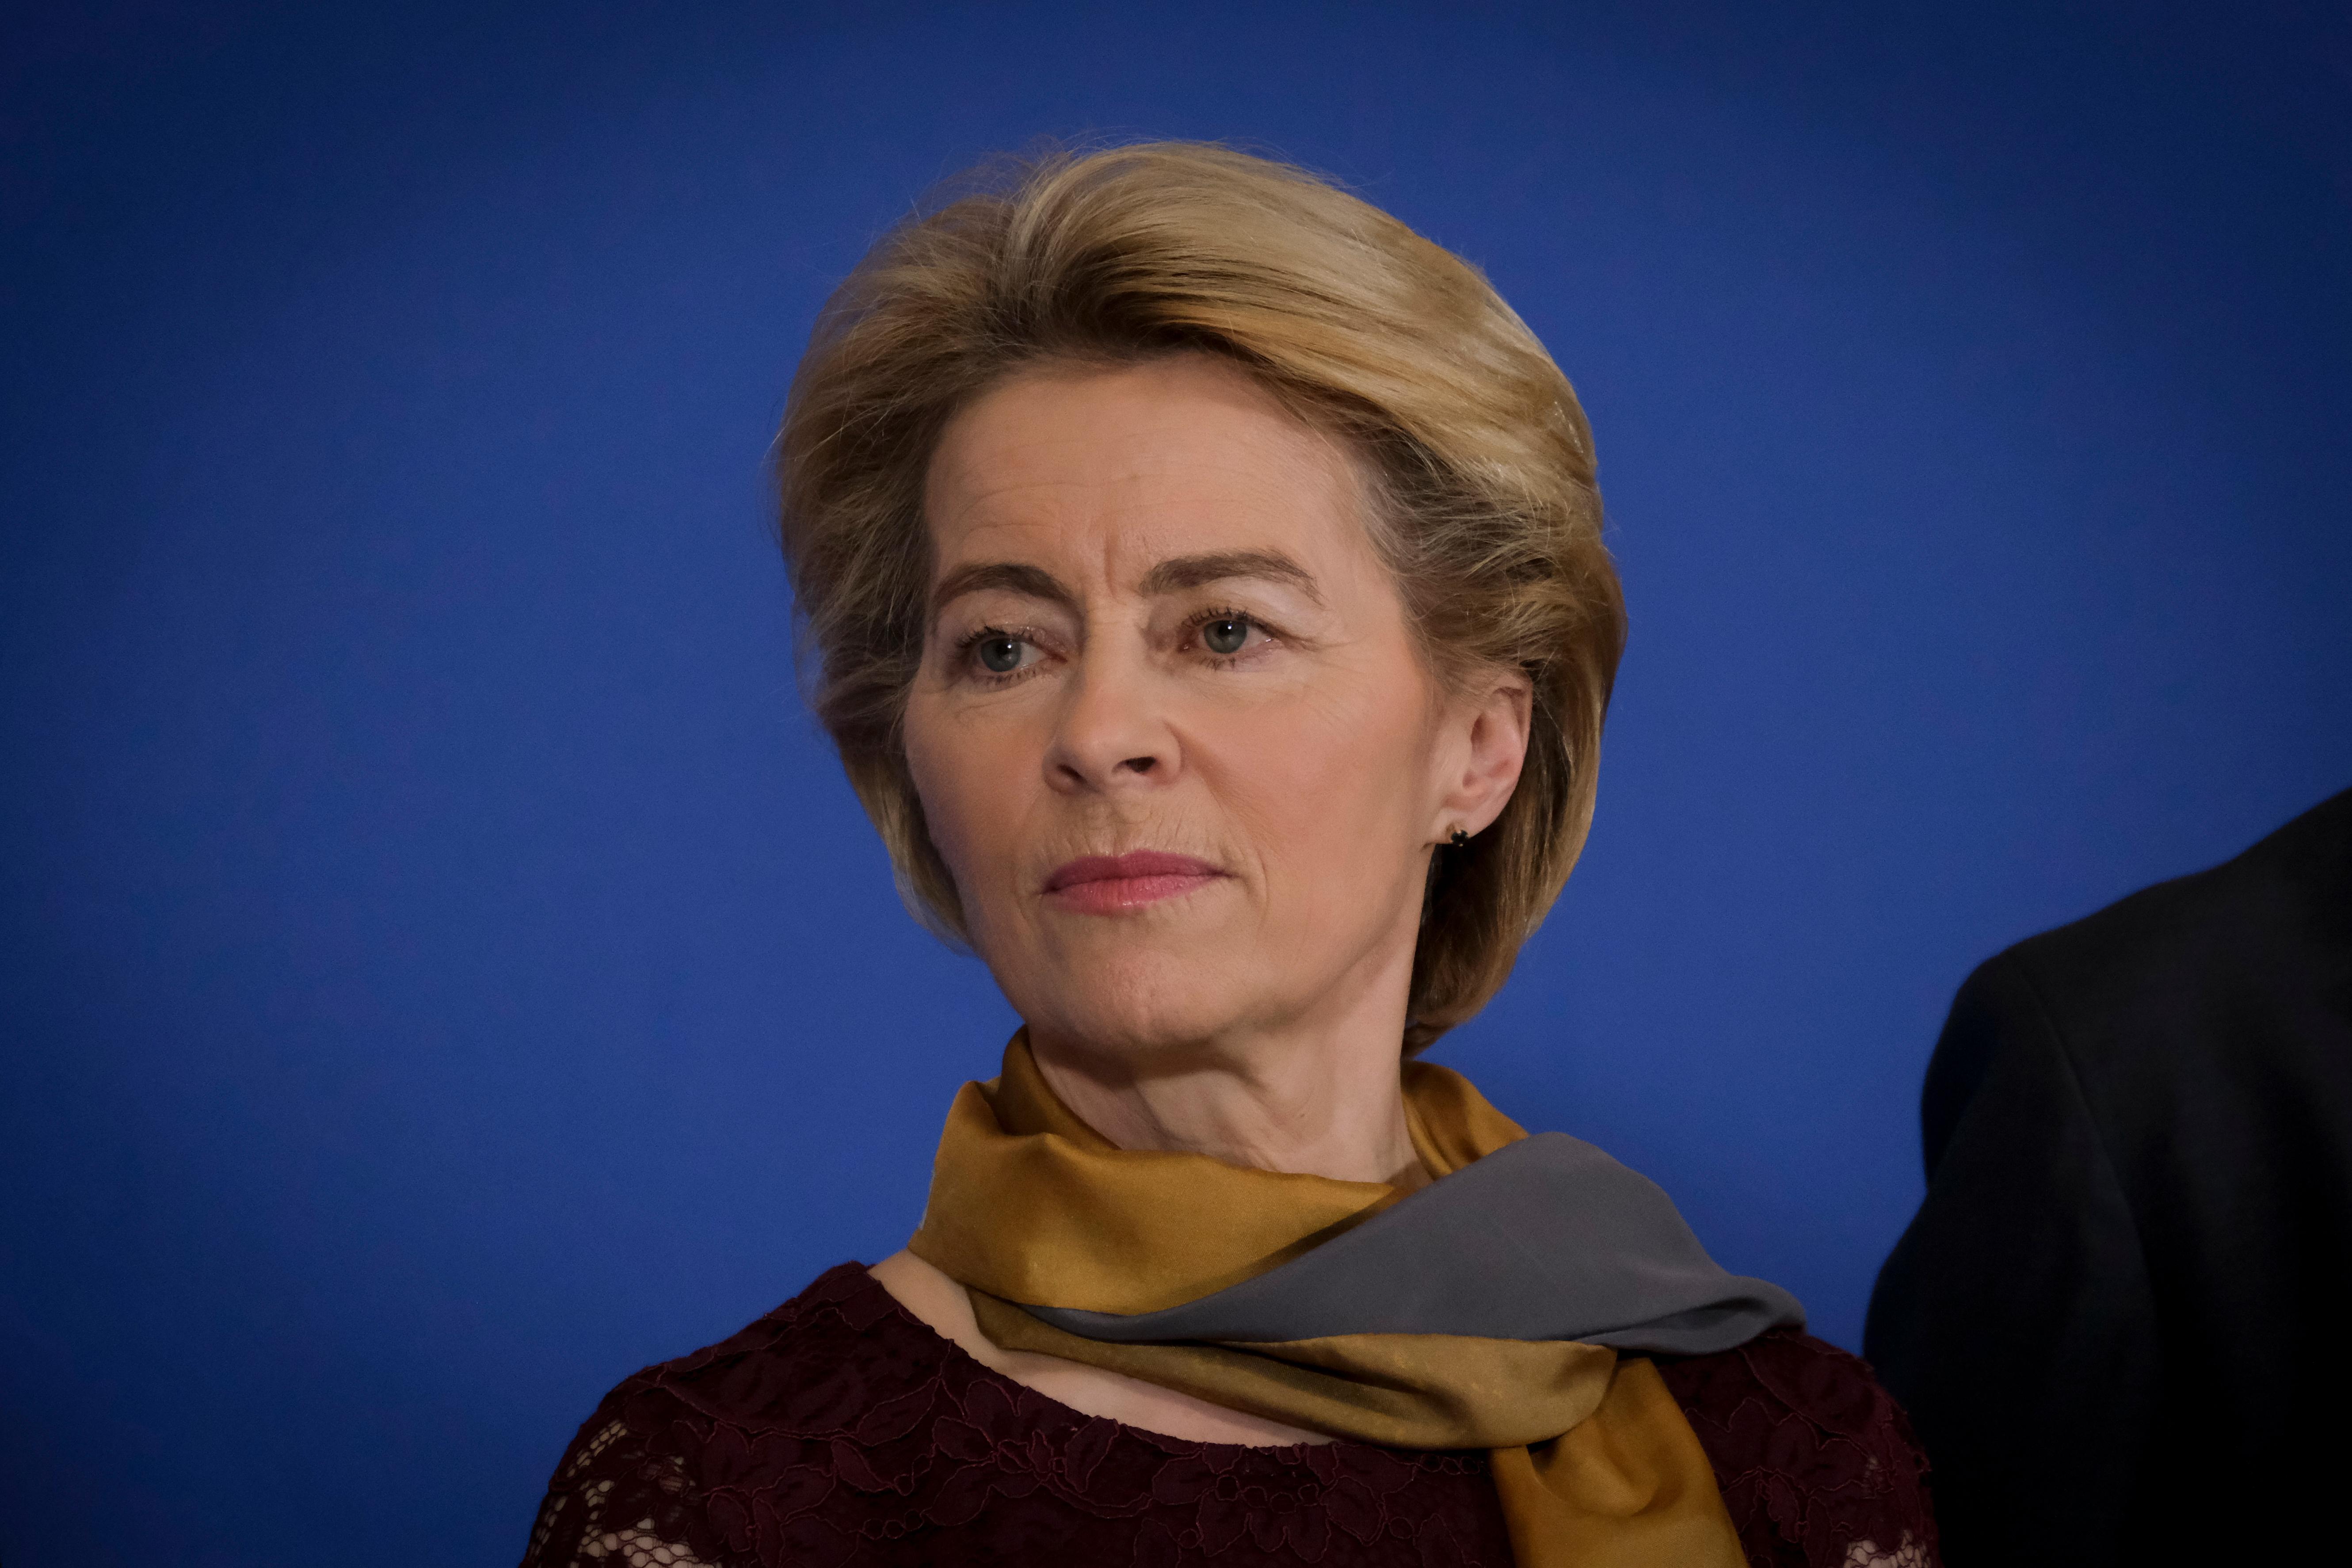 رئیس کمیسیون اروپا اورسولا فون در لاین (عکس © Alexandros Michailidis / Shutterstock)